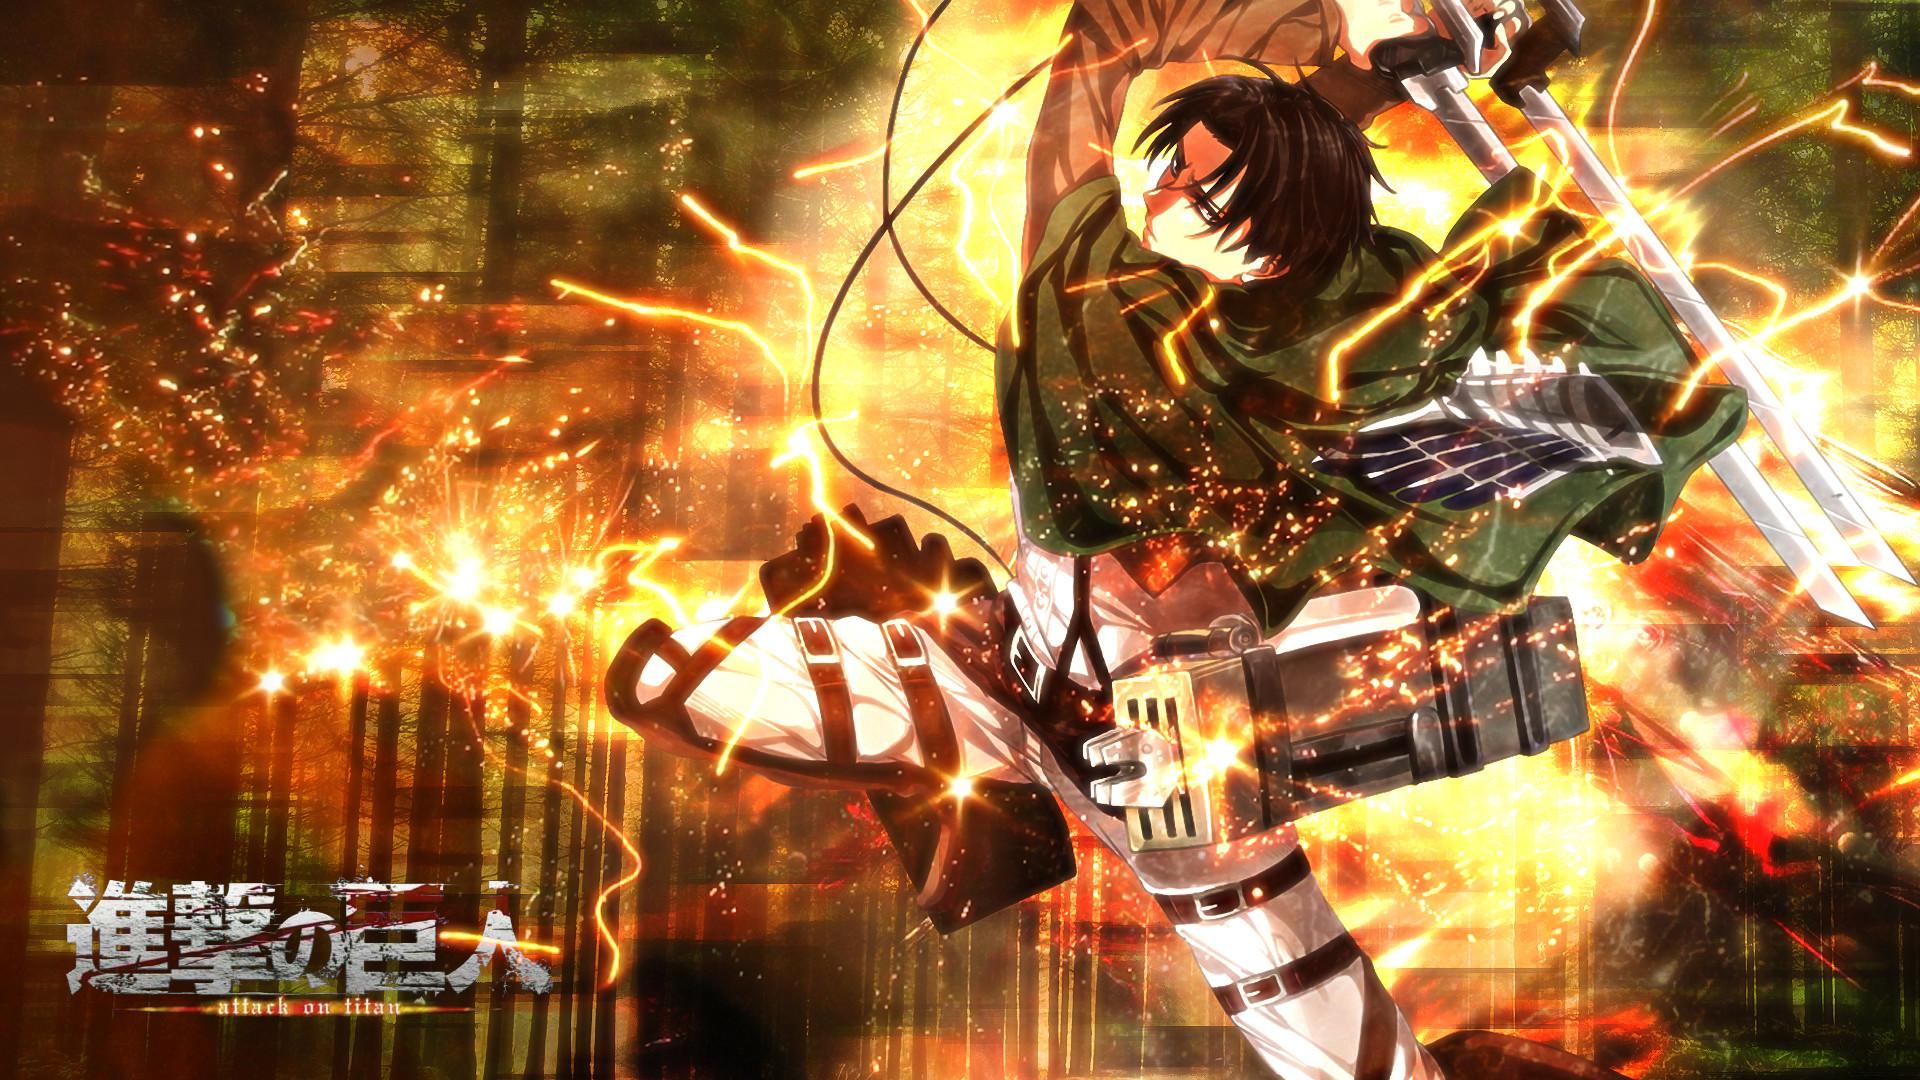 Attack on Titan – Levi Ackerman   Wallpapers   Pinterest   Anime and Levi  ackerman